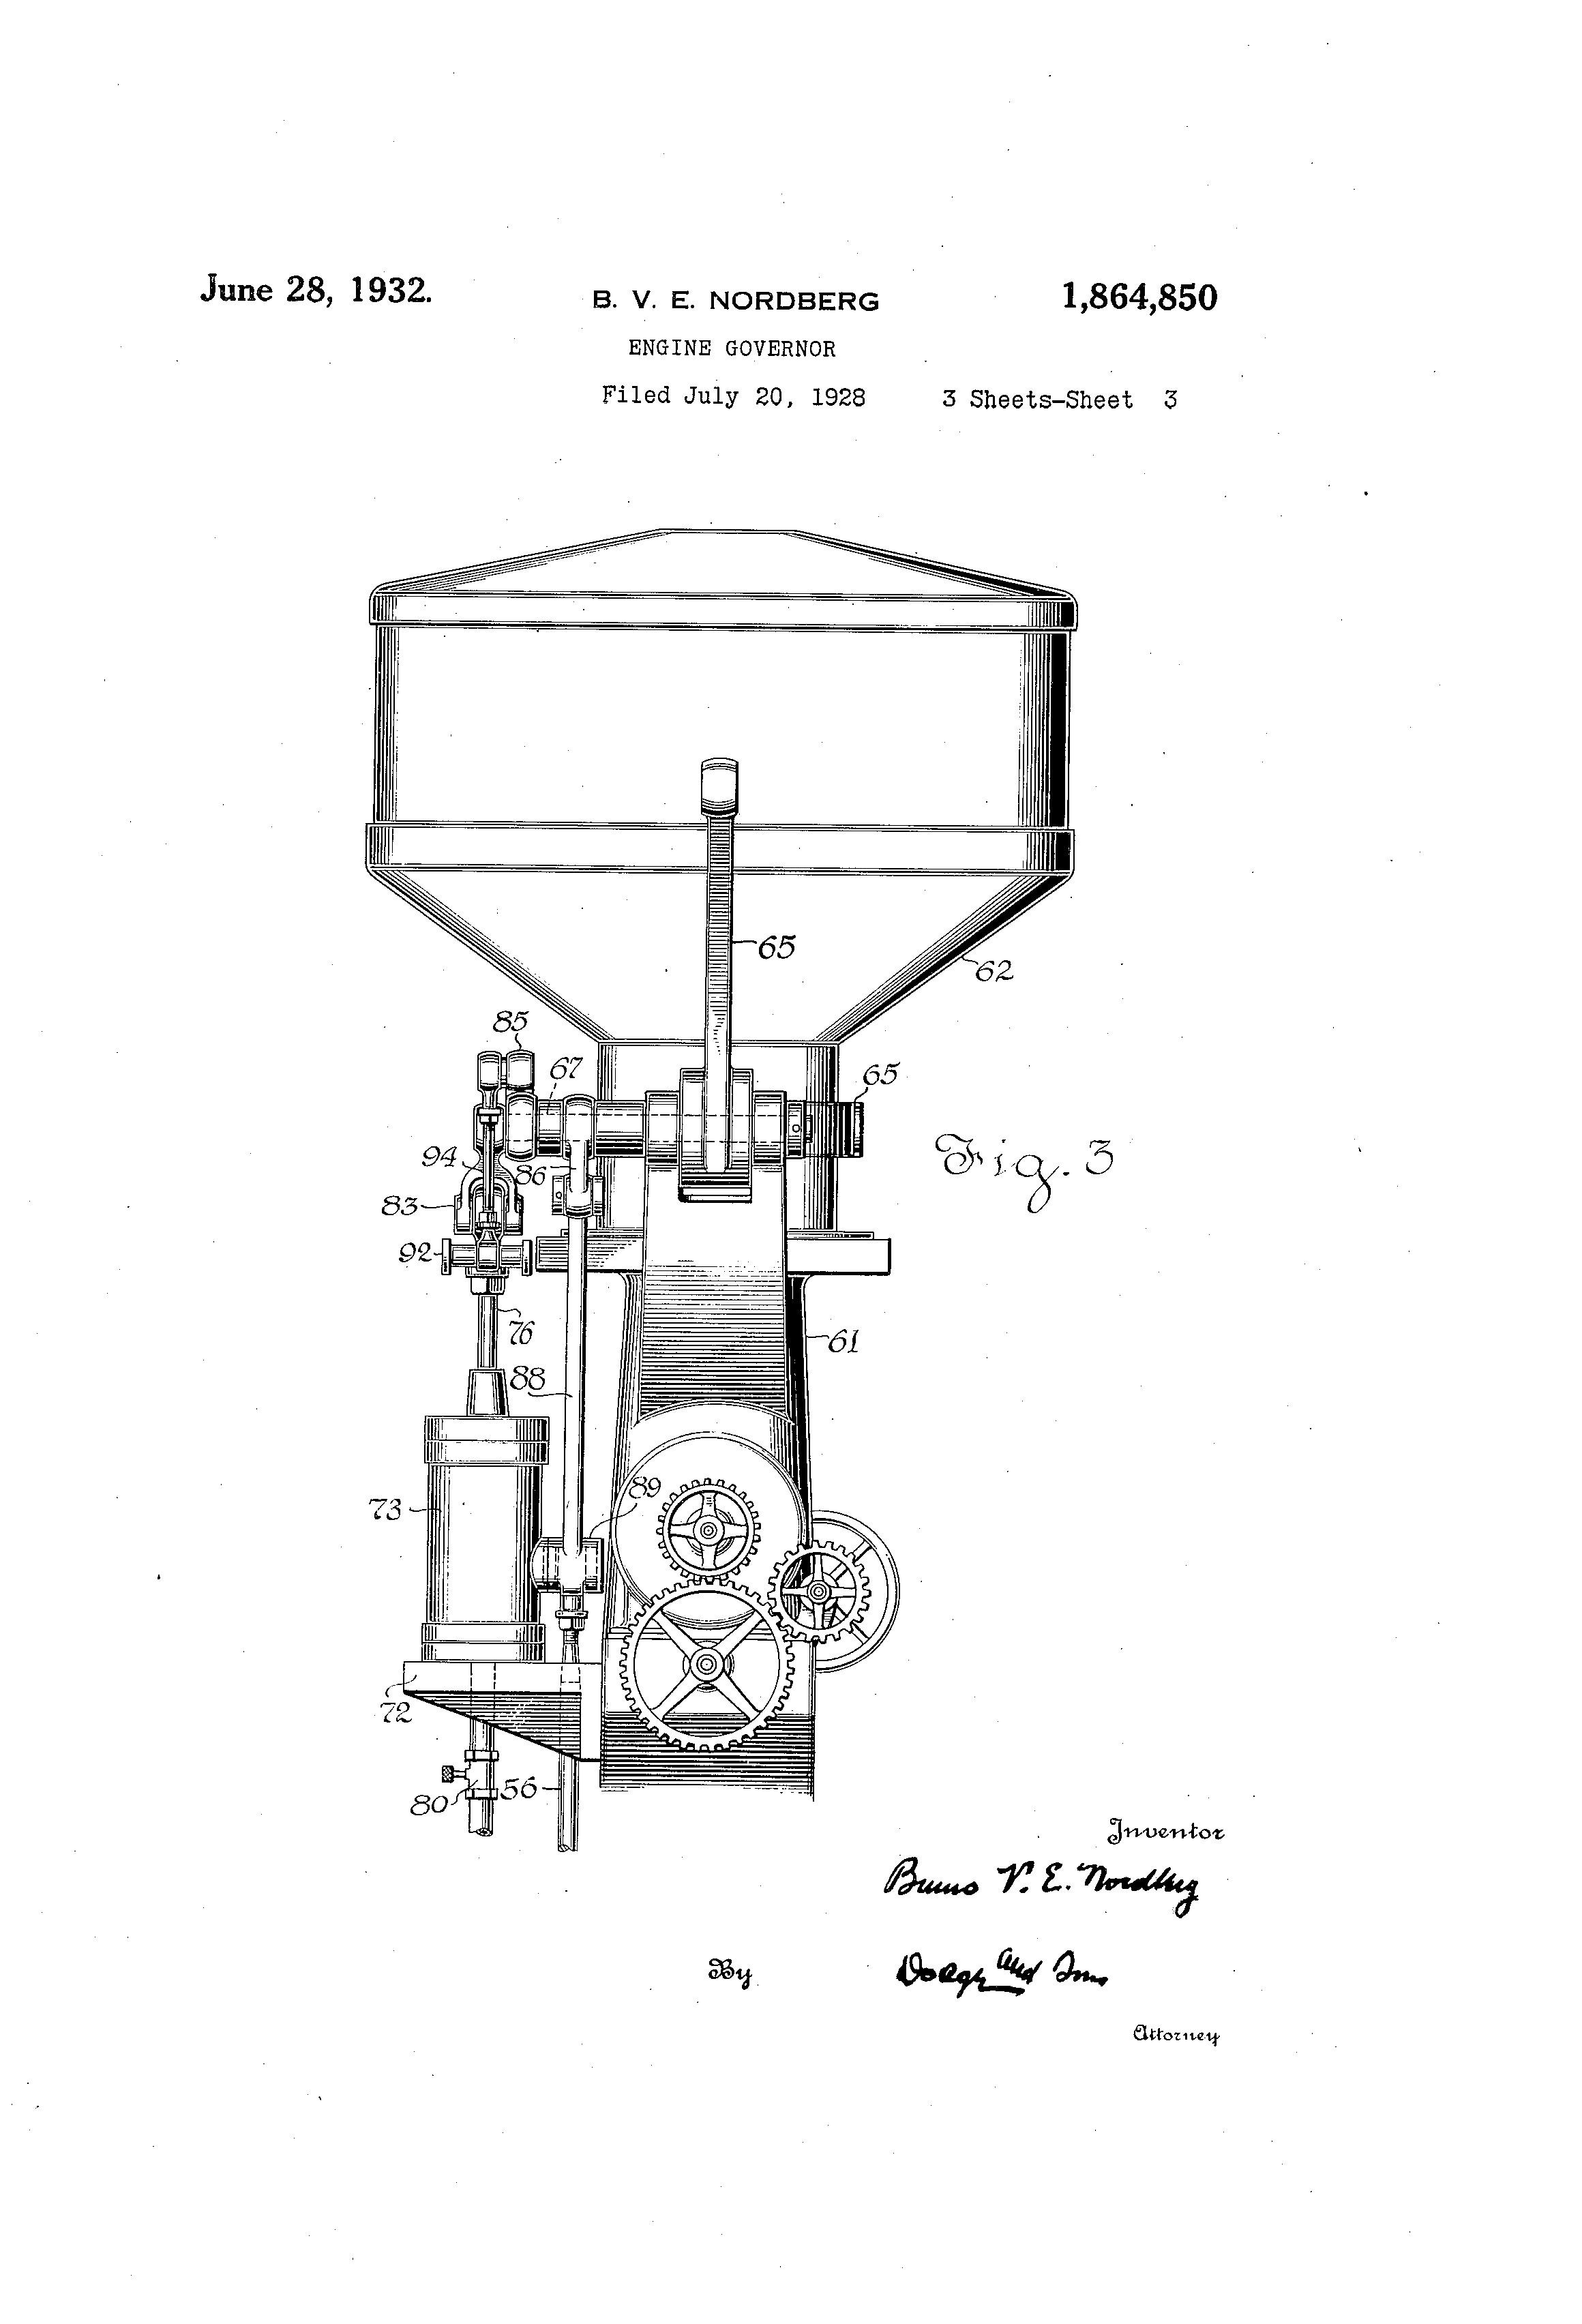 Harley Engine Diagram Patent Us Engine Governor Google Patents Of Harley  Engine Diagram Also Honda Motorcycle